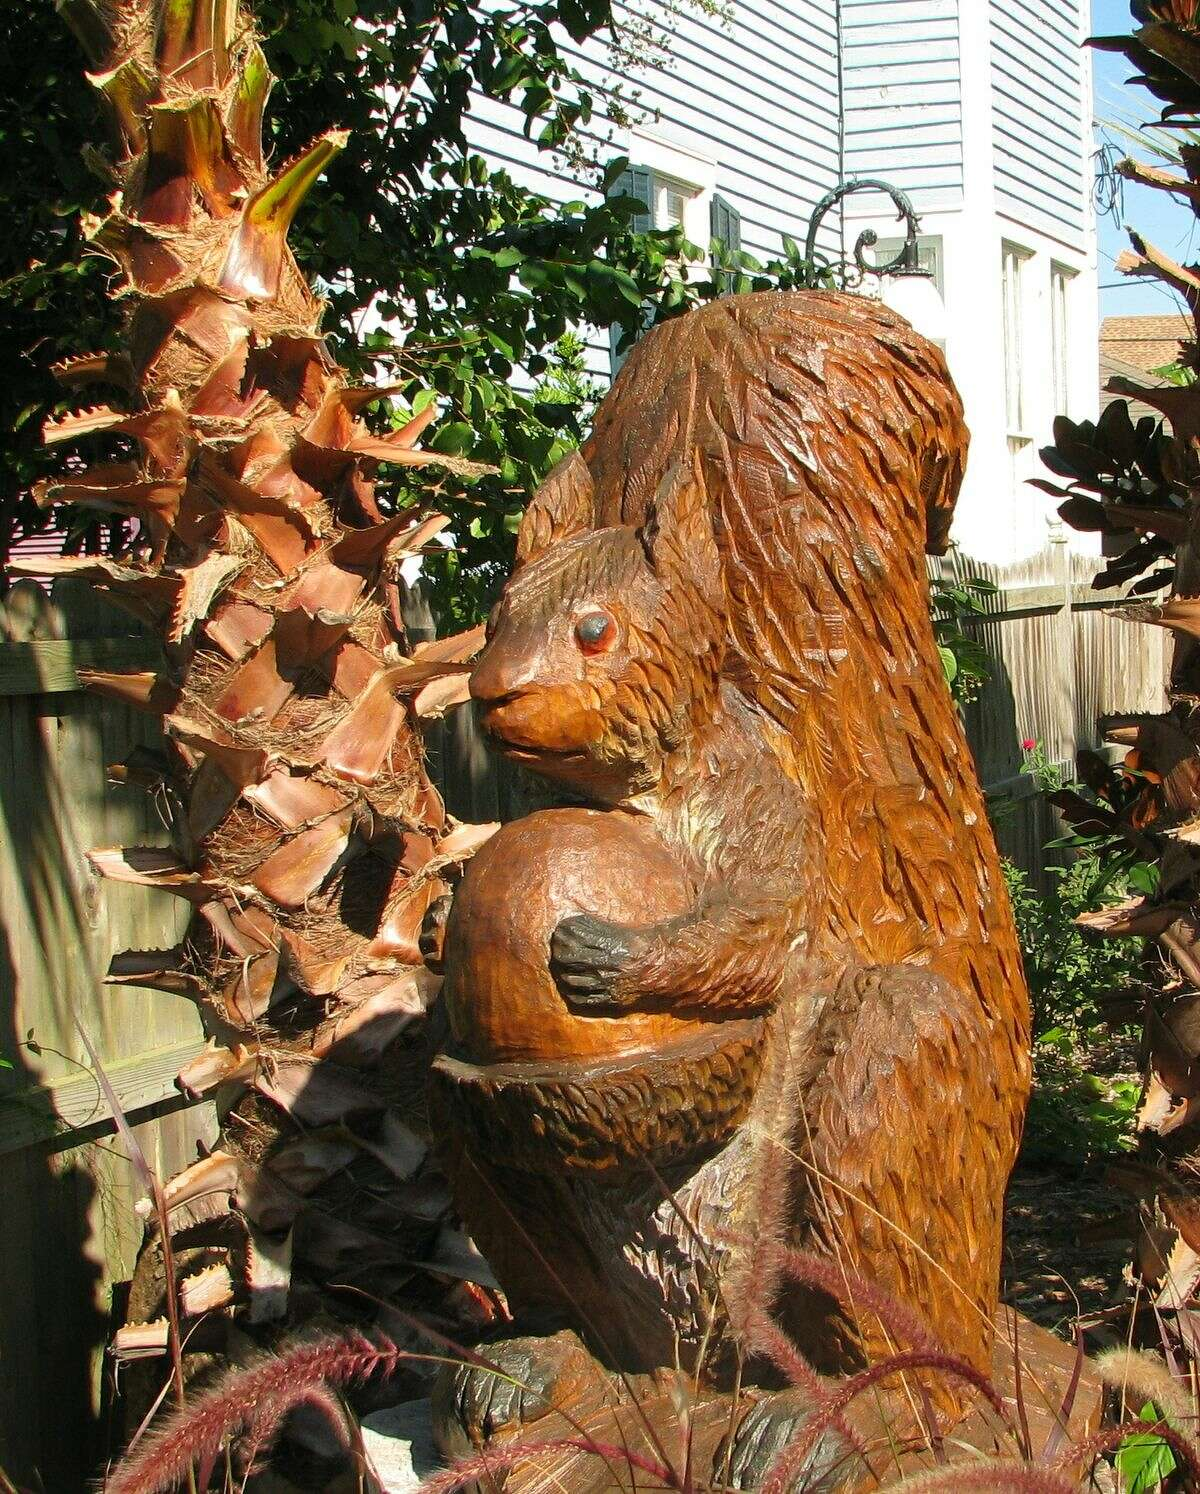 A squirrel clutches an acorn in this hurricane tree sculpture in Galveston.